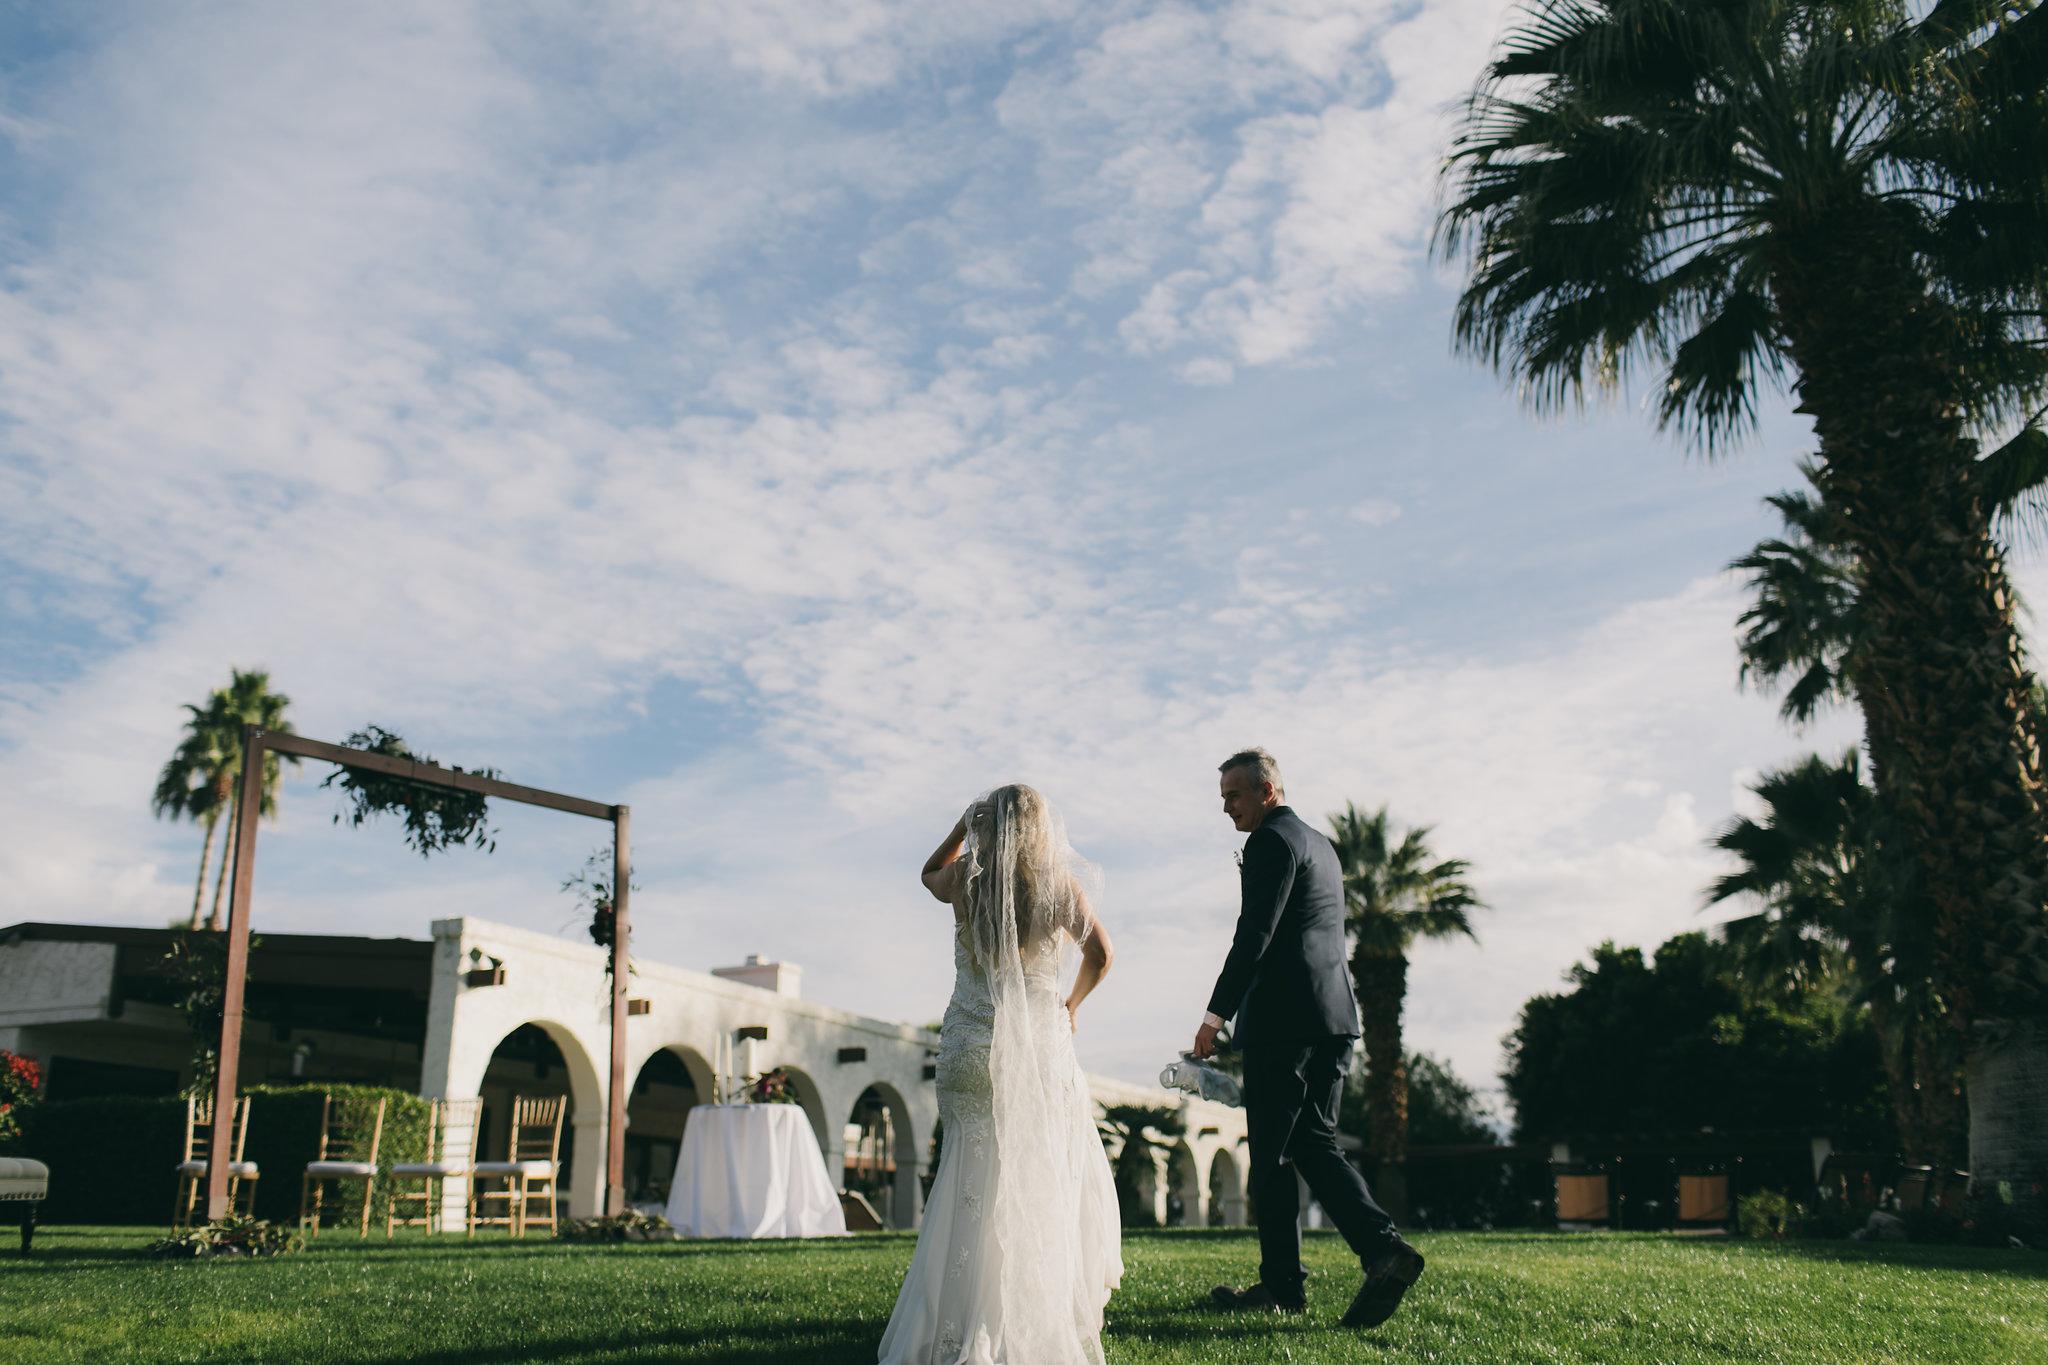 Gracy-Andrew-Wedding-252.jpg